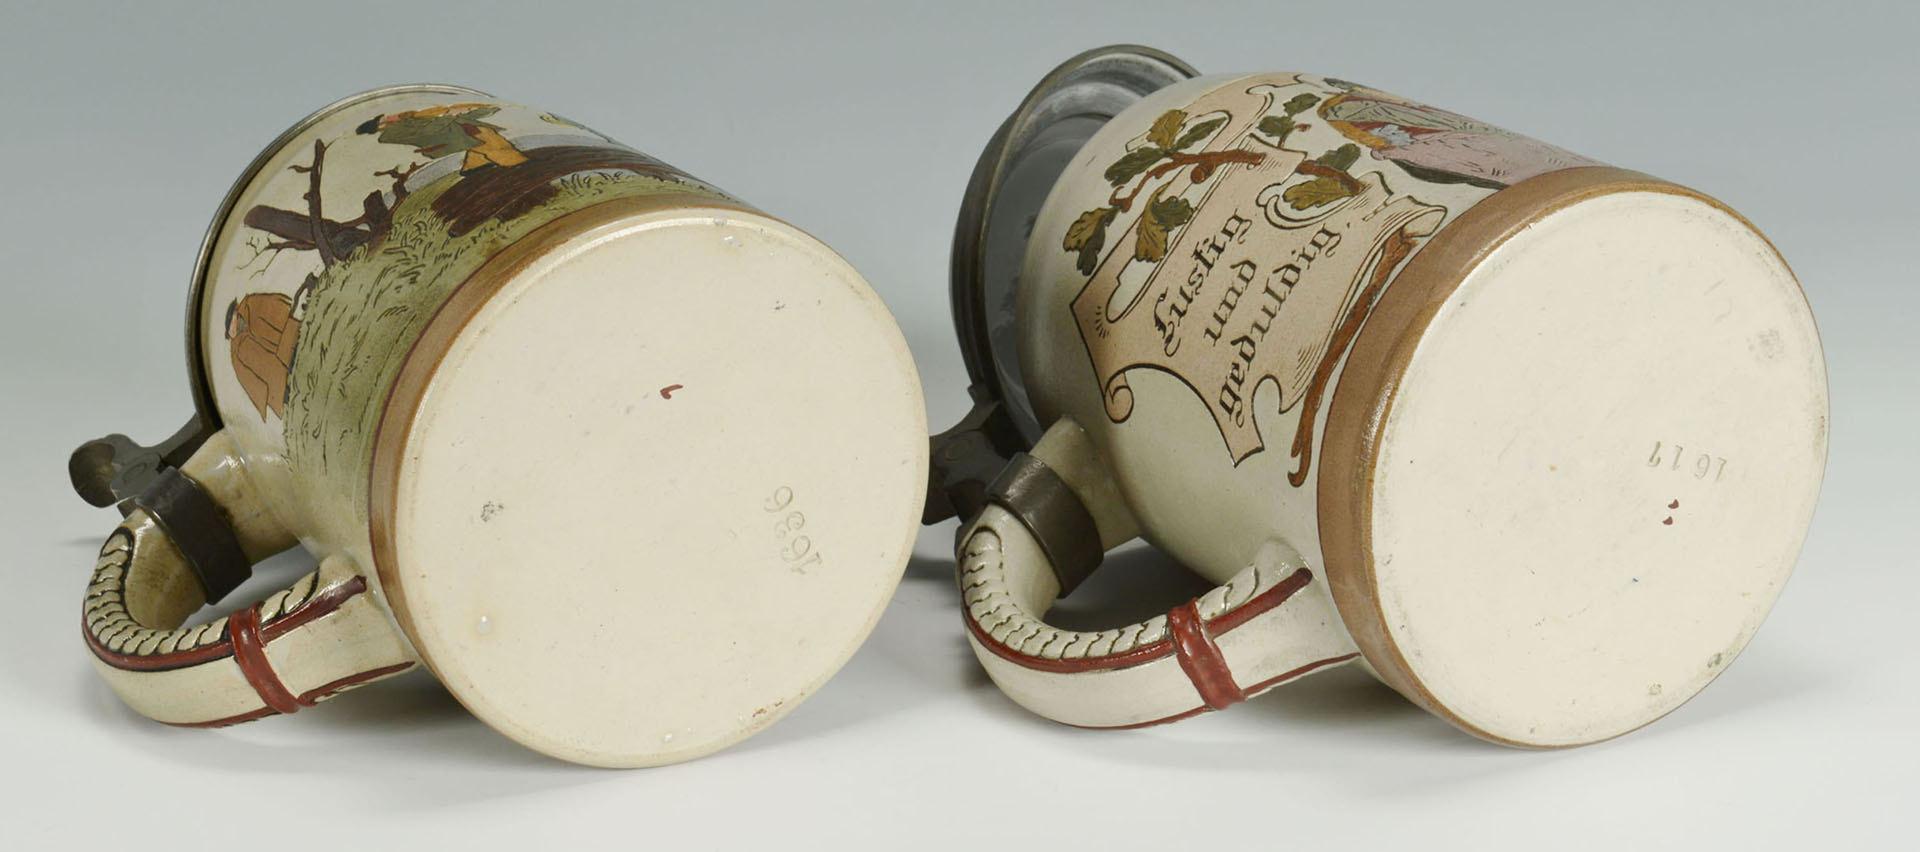 Lot 470: 2 Incised German Steins, 1 Washington D.C.